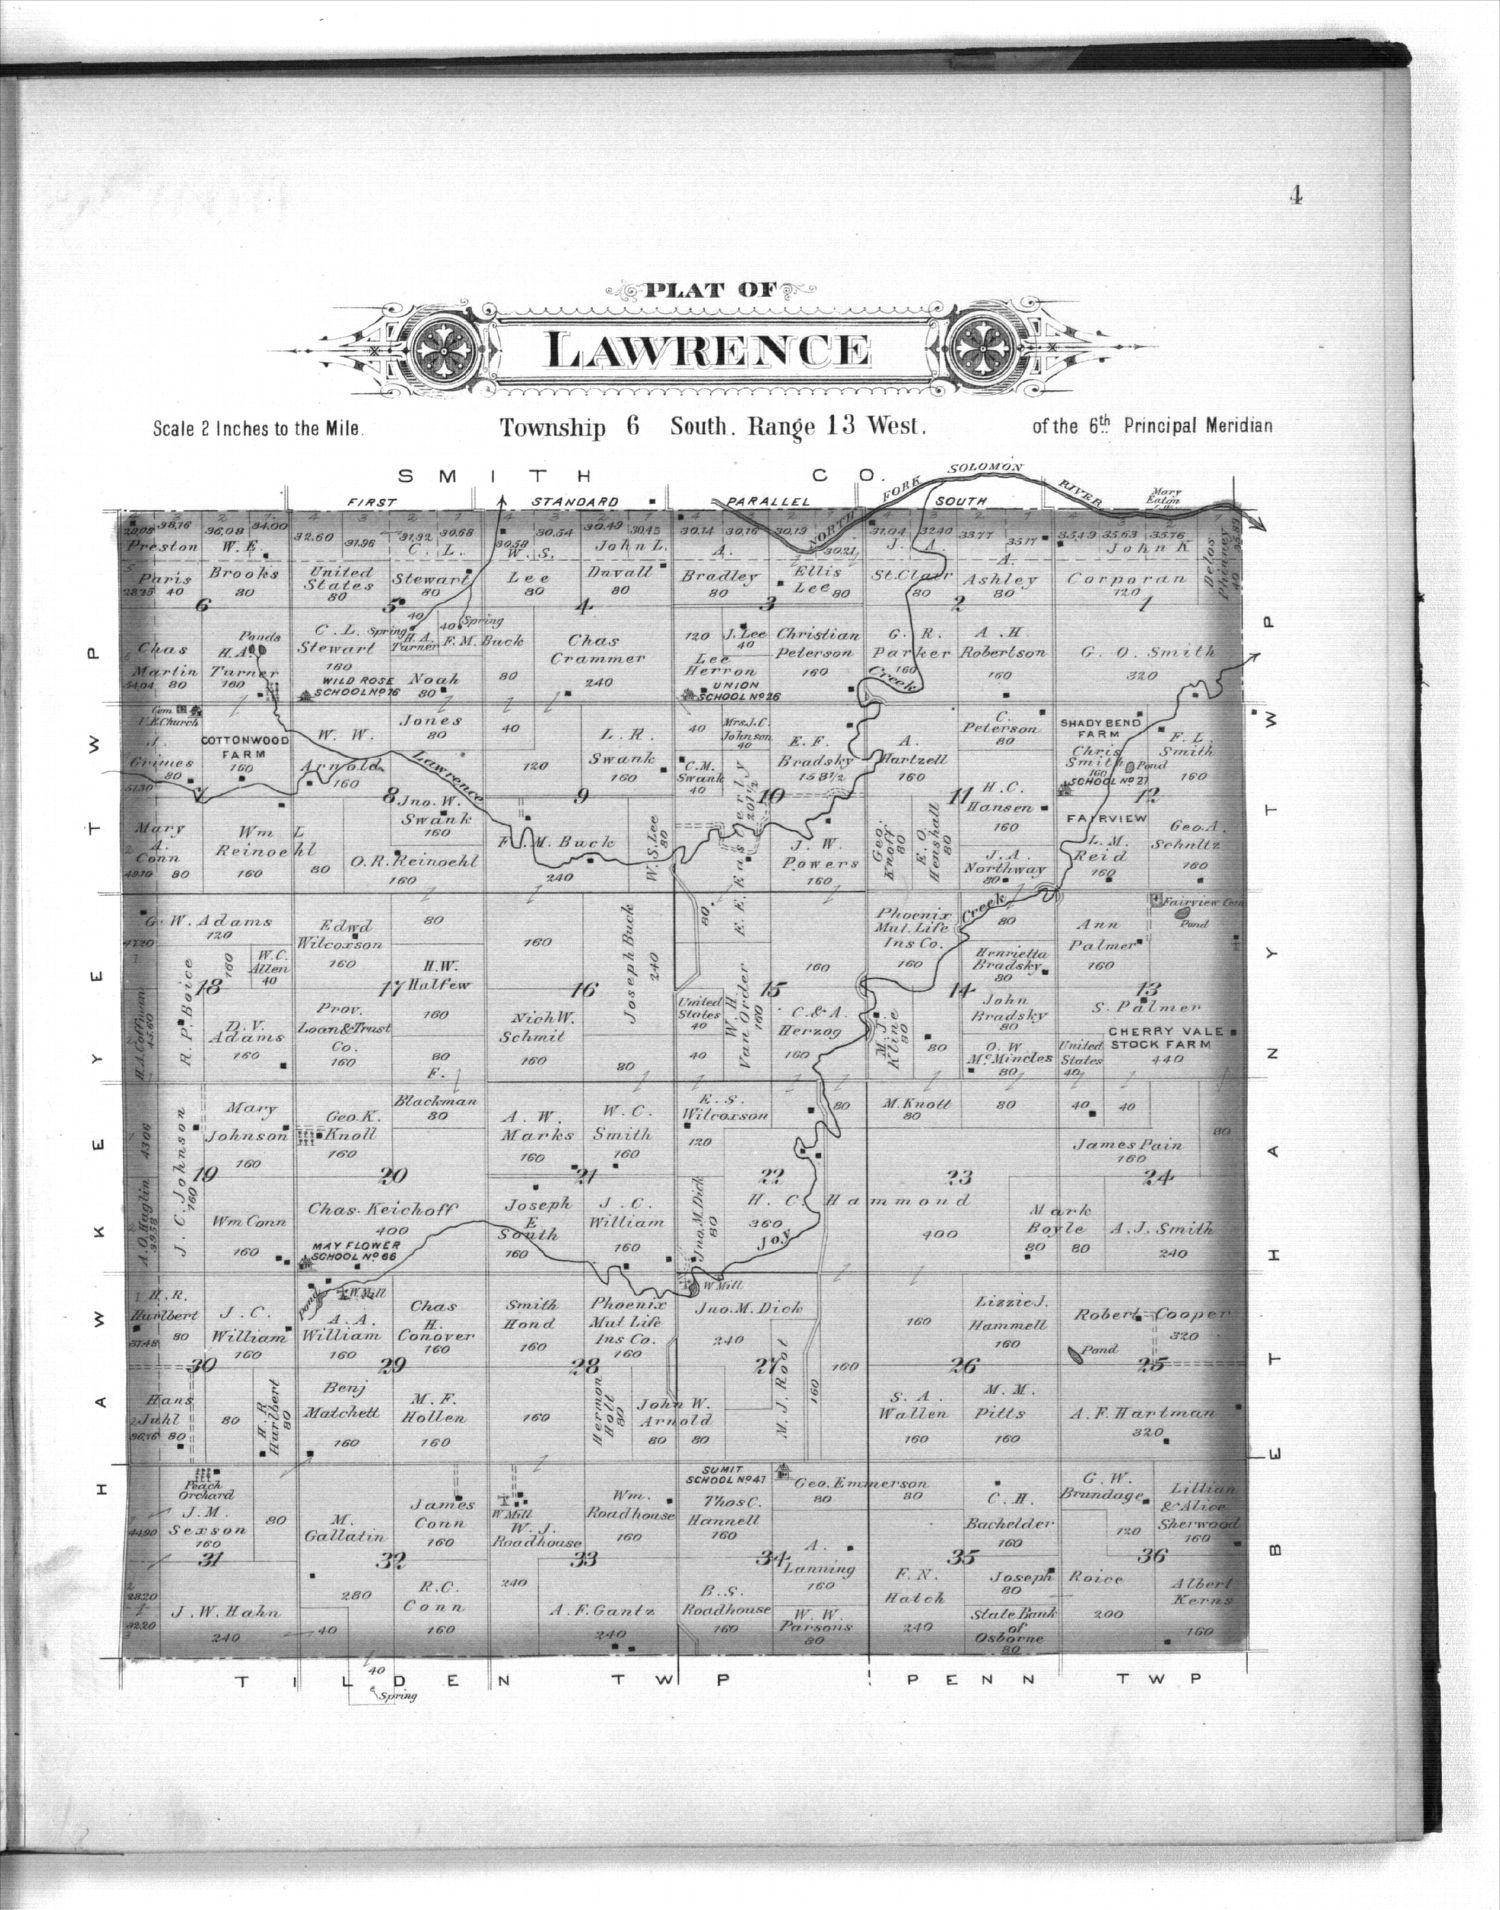 Plat book of Osborne County, Kansas - 4